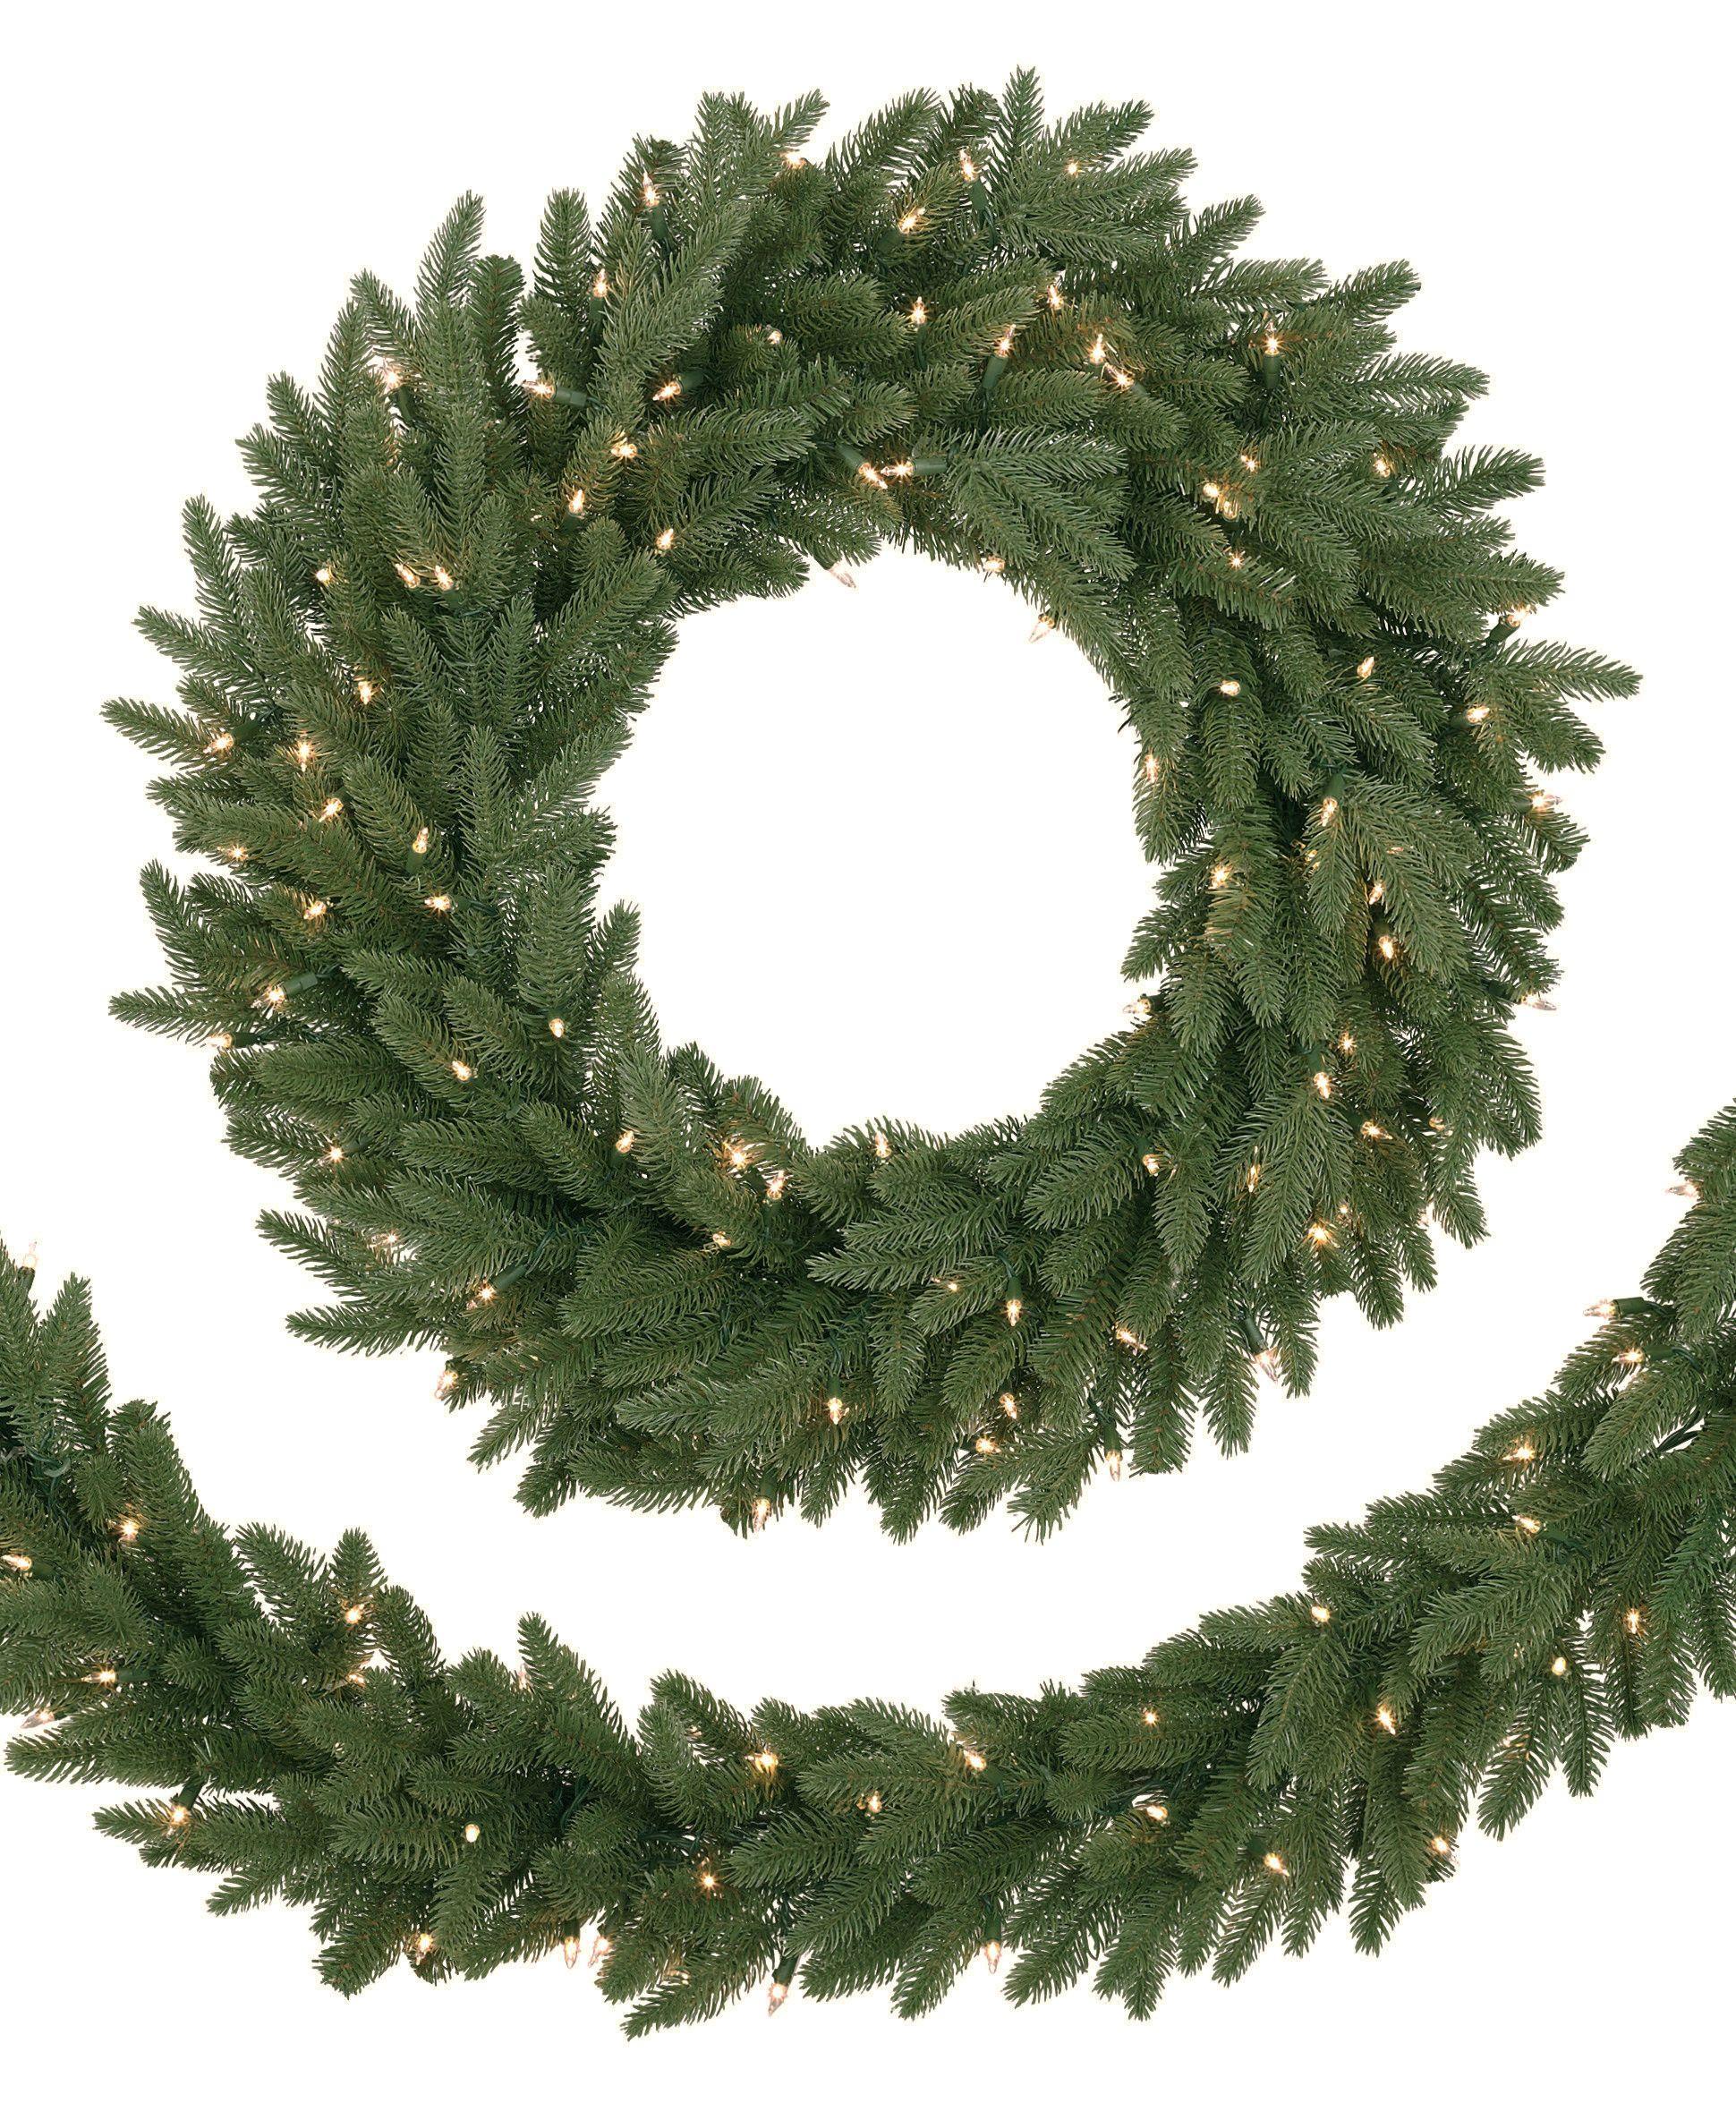 Kennedy Fir Christmas Tree: Artificial Christmas Wreaths